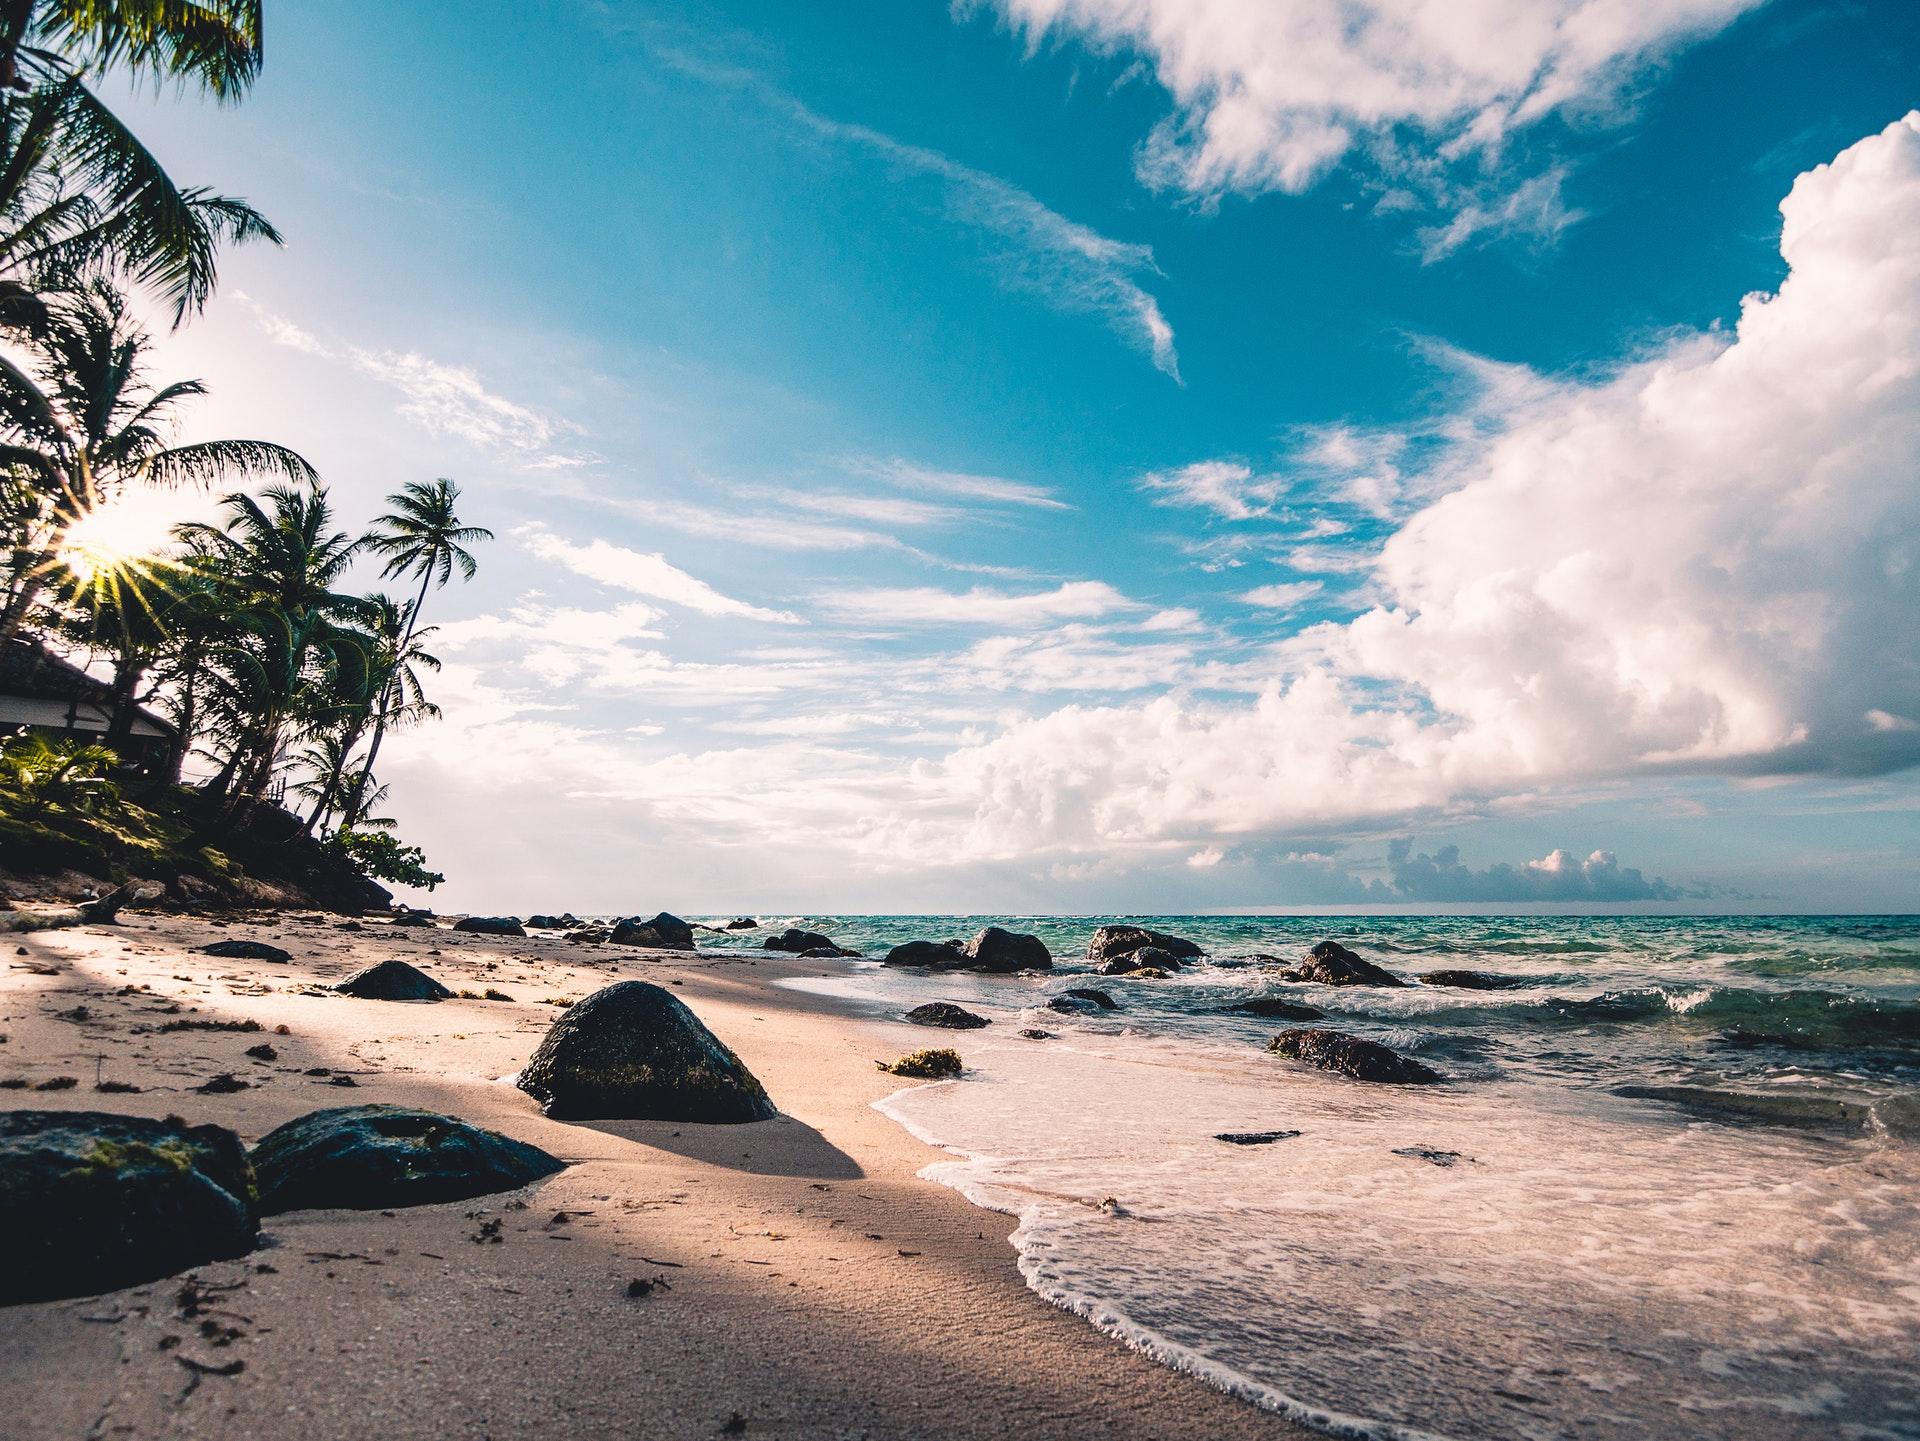 Mauritius honeymoon destination